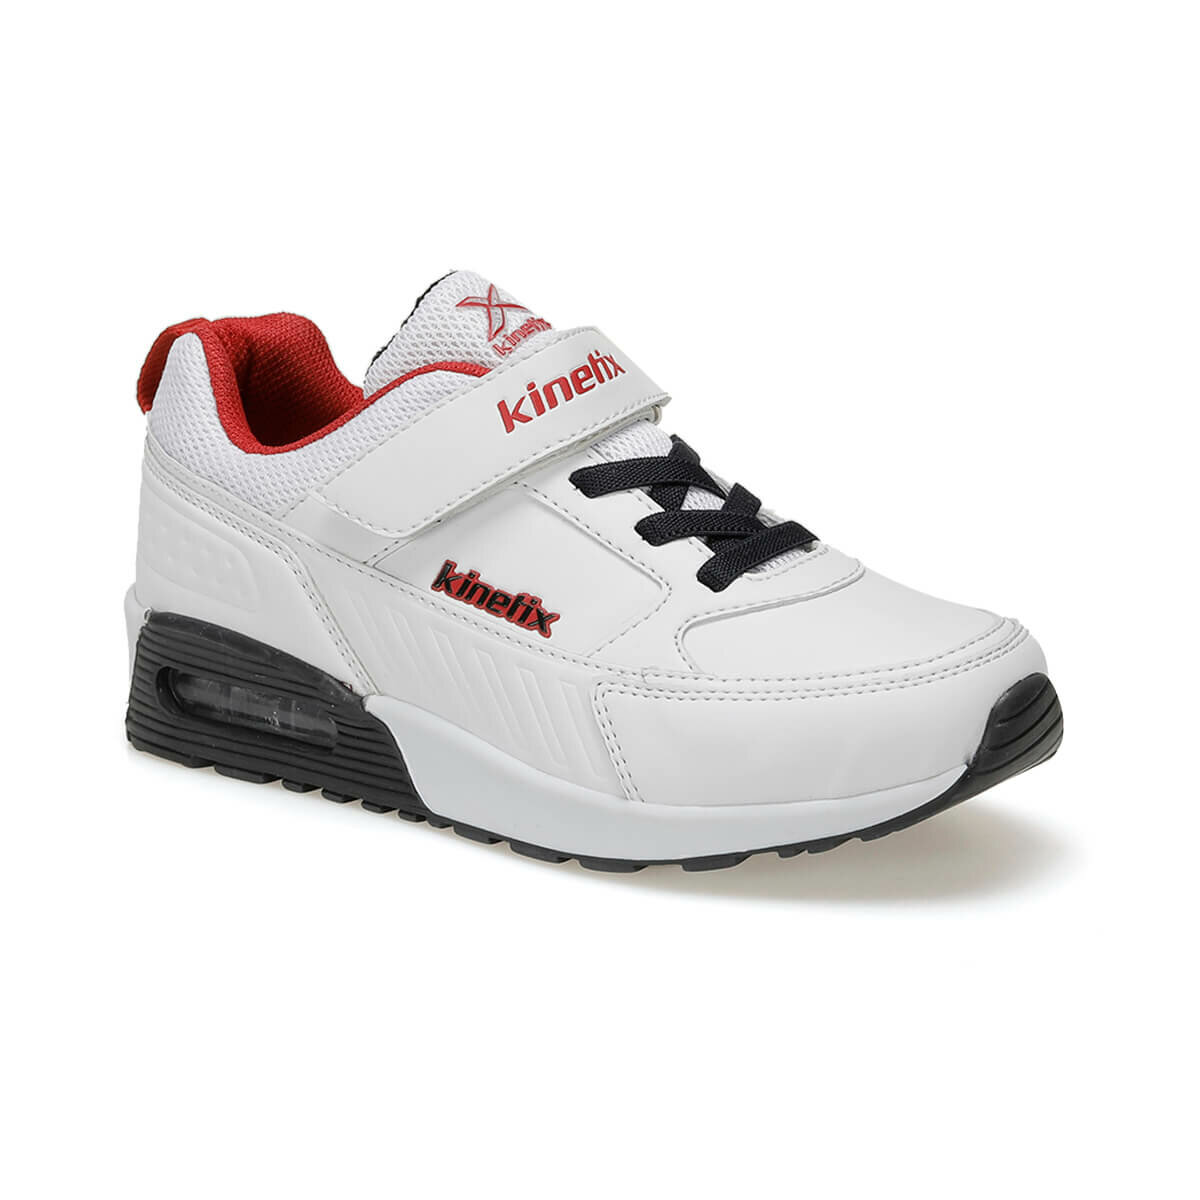 FLO HAZEL 9PR White Male Child Sneaker Shoes KINETIX